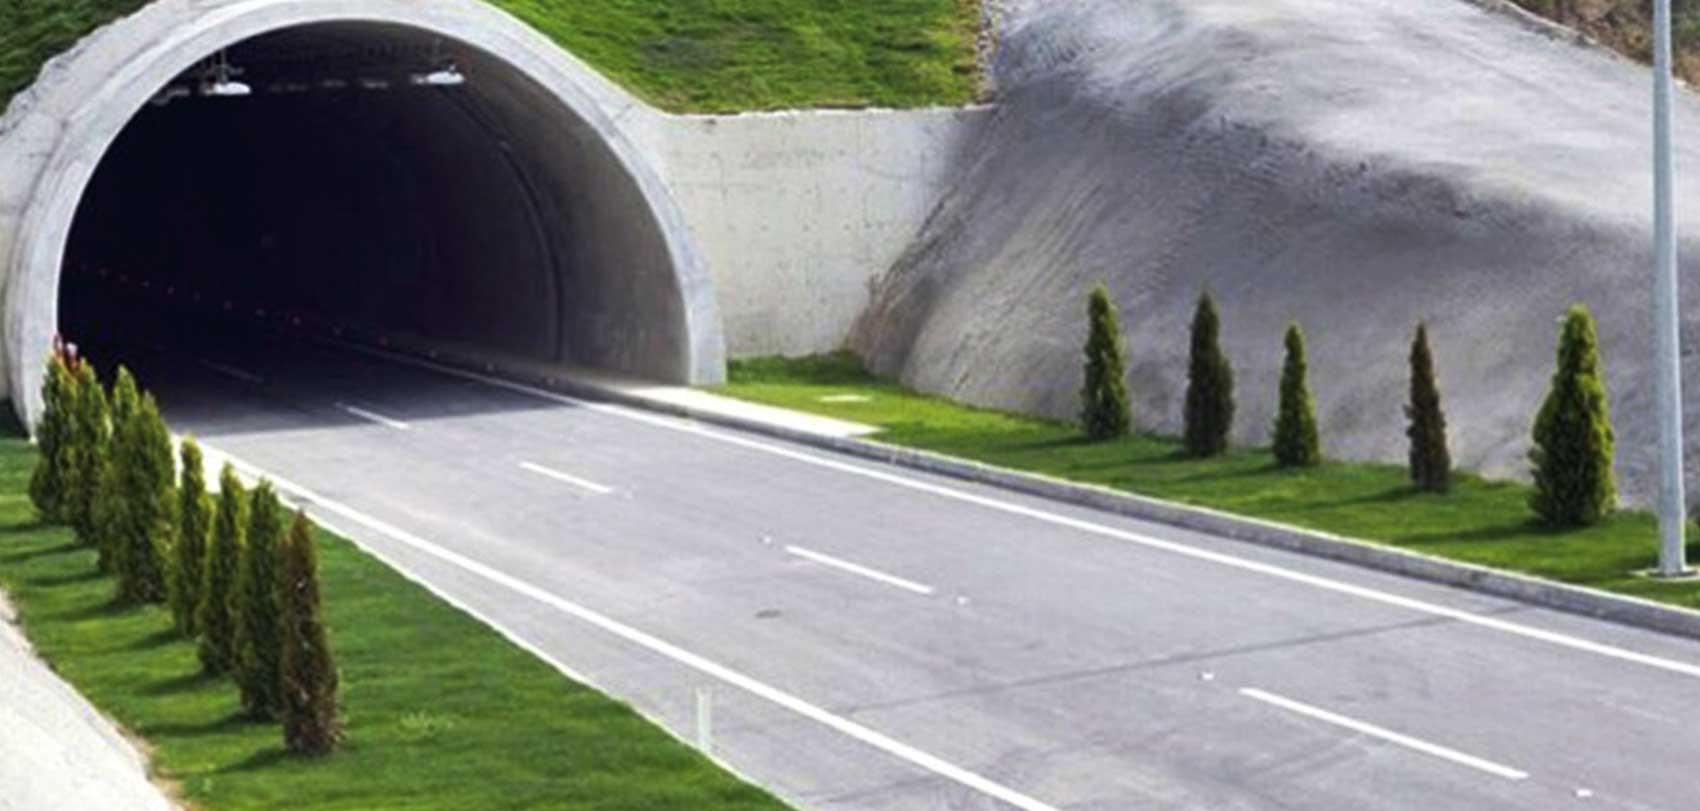 भीमफेदी–कुलेखानी सुरुङमार्ग निर्माण कार्य सुरू हुँदै